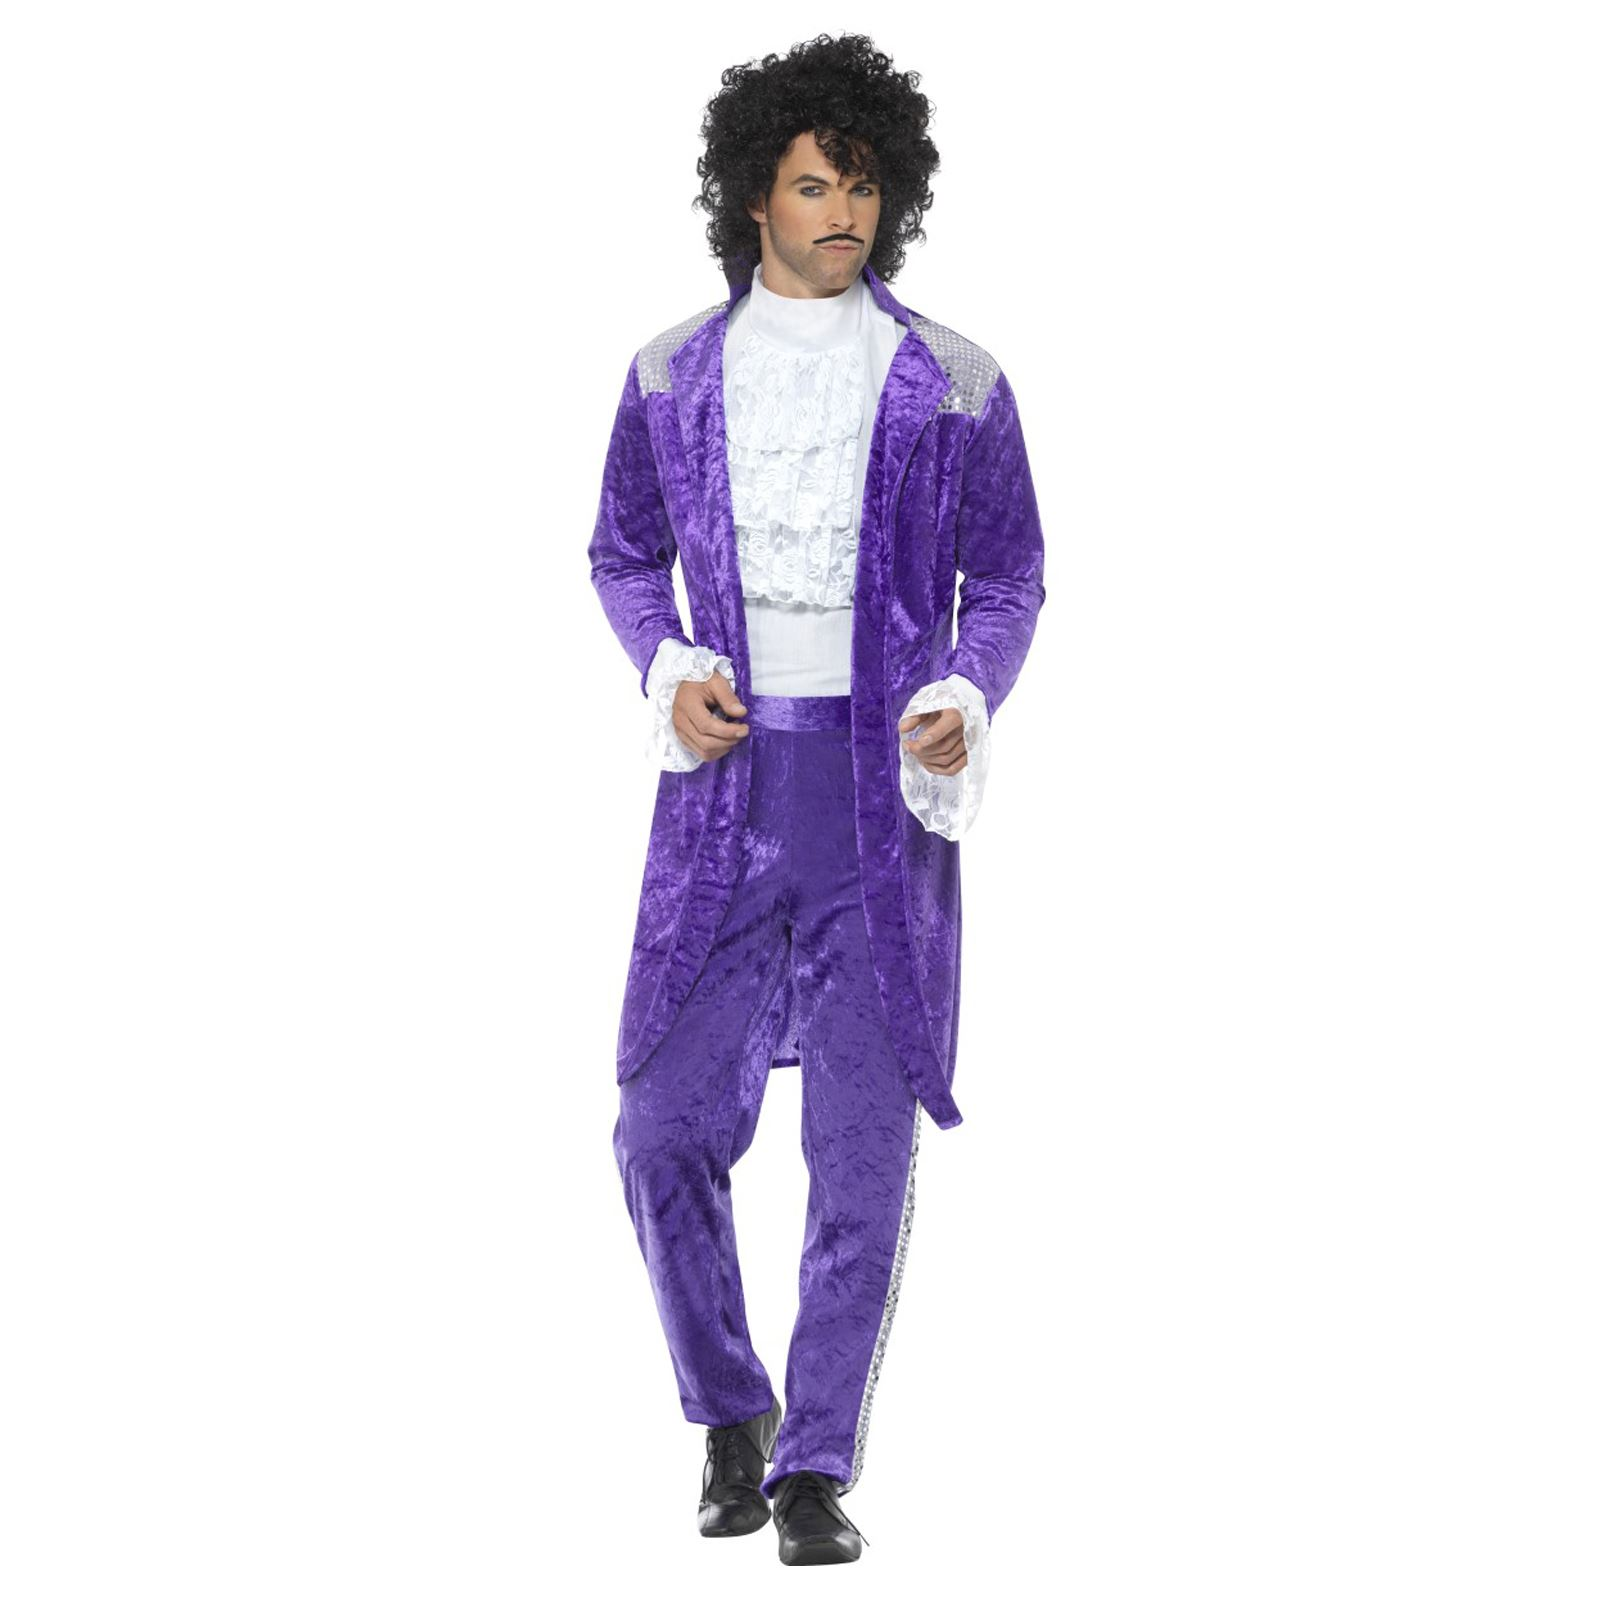 9141f1ee331063 80s Mens Purple Musician Prince Queen Suit Jacket Trousers Fancy ...